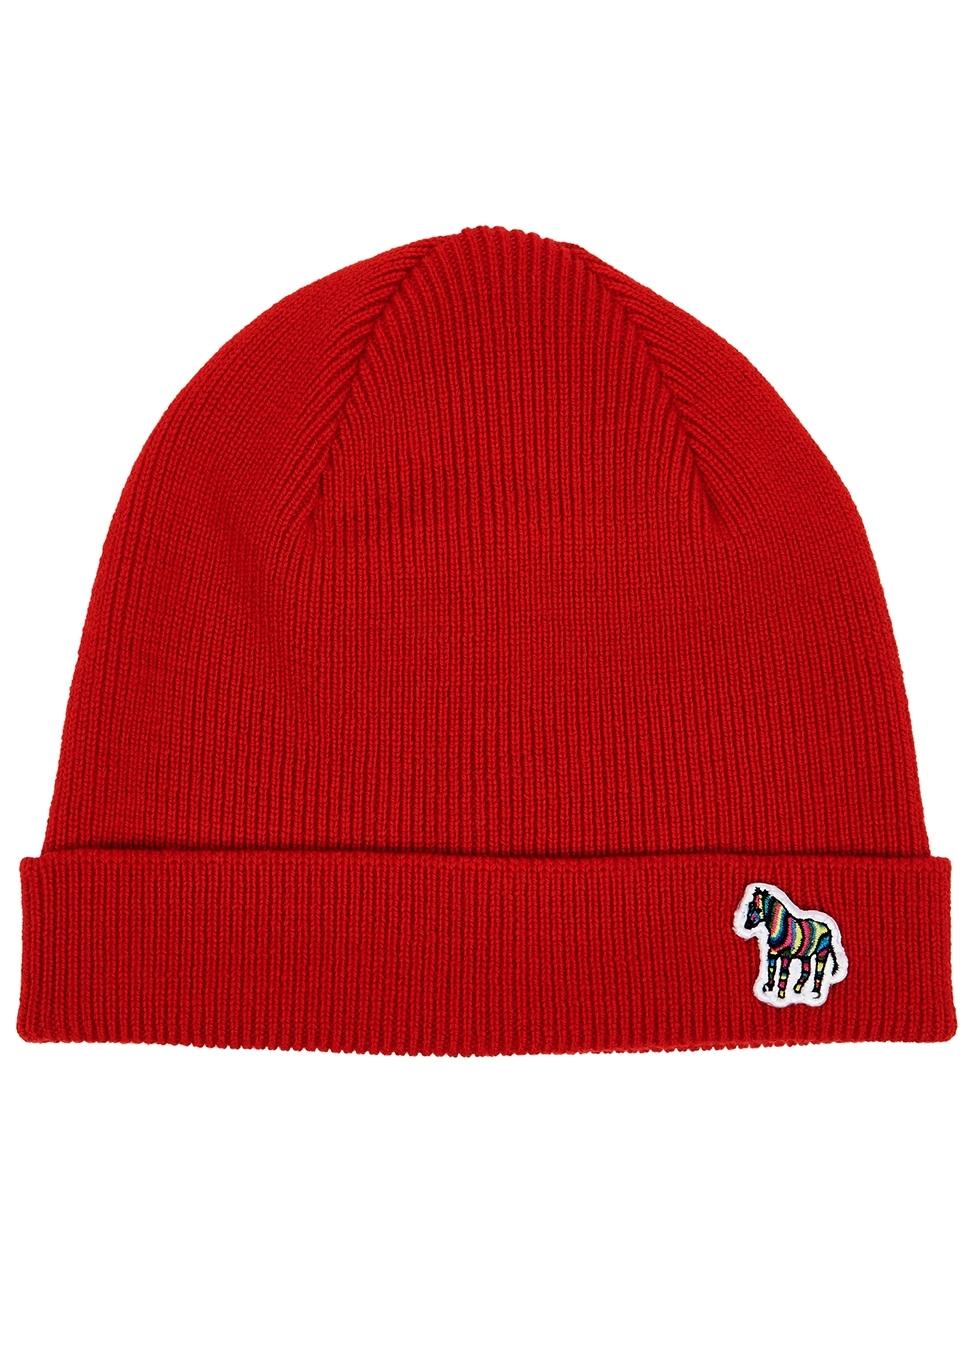 ac698c089f814 Men s Designer Hats - Harvey Nichols